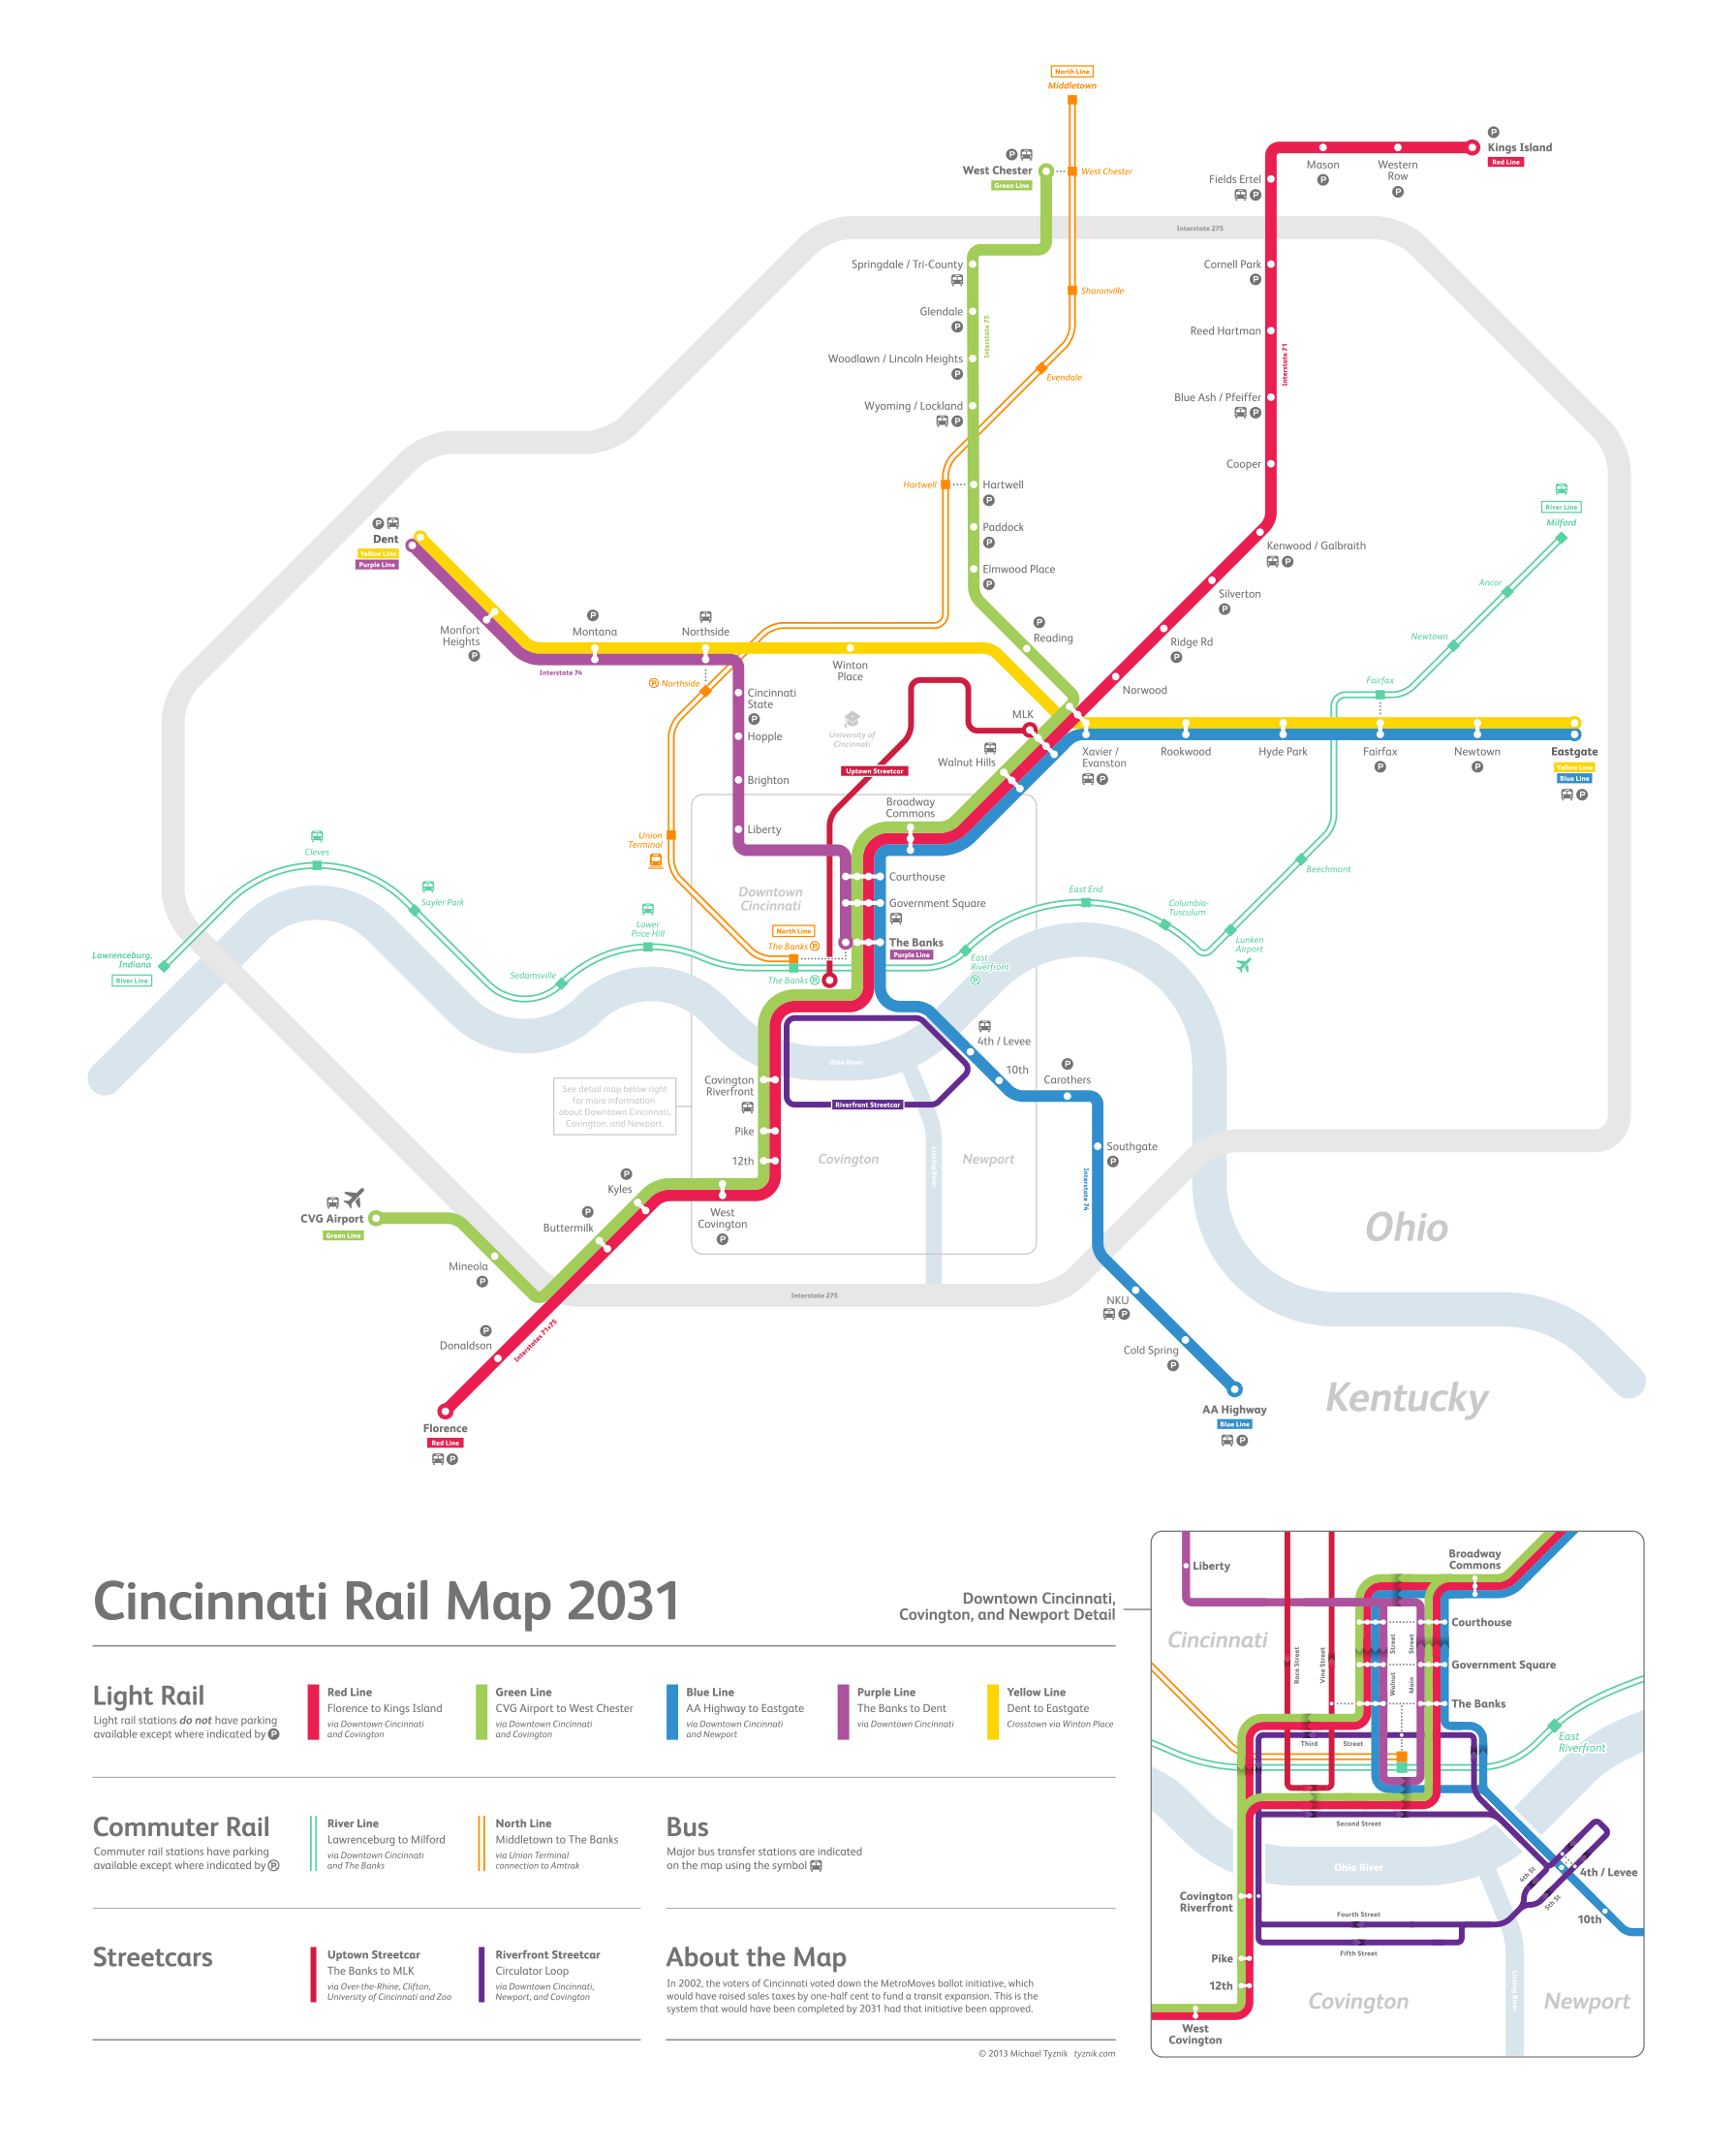 Cincinnati Subway Map.Cincinnati Rail Map 2031 Michael Tyznik Xenoglaux Design Bureau